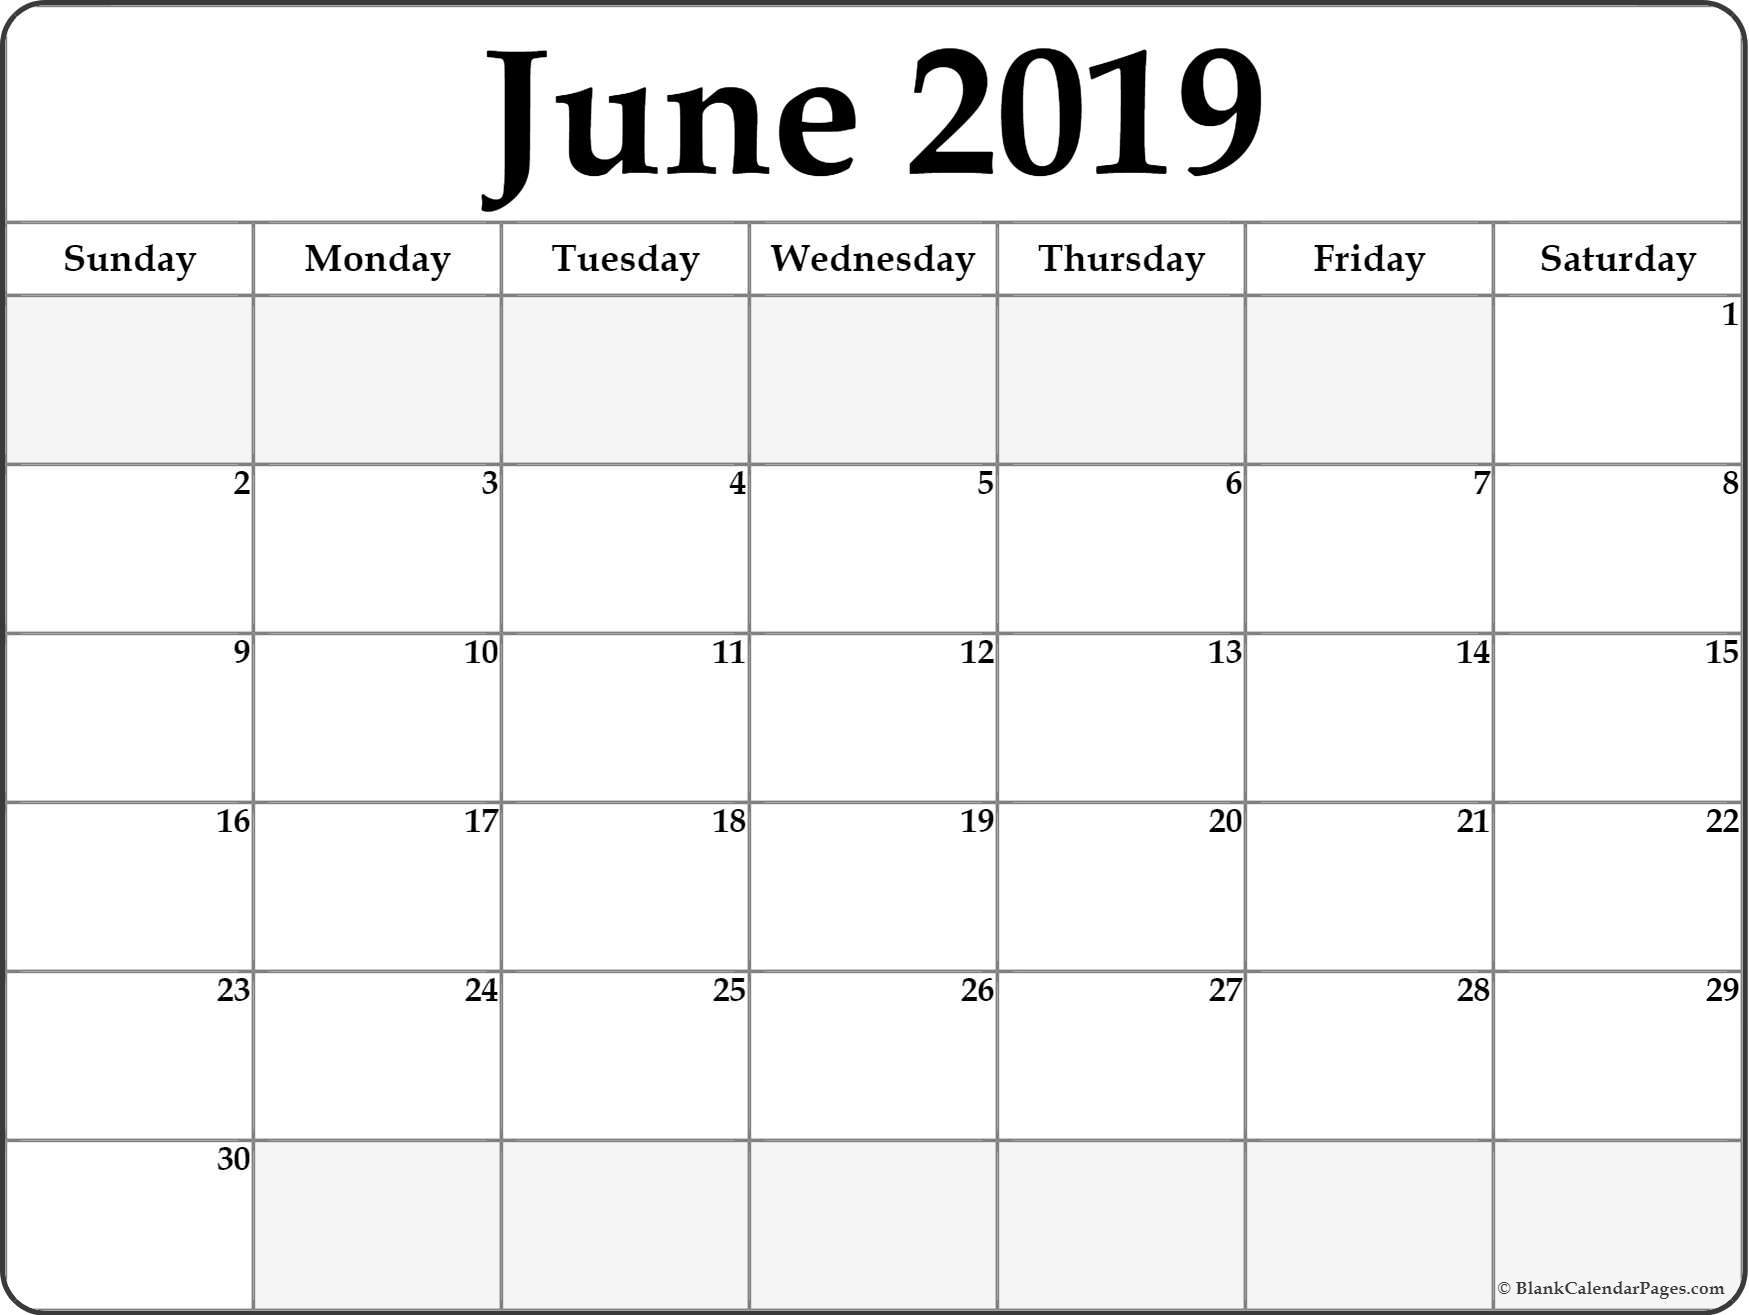 June 2019 Calendar | Free Printable Monthly Calendars Free Printable Calendar Double Month